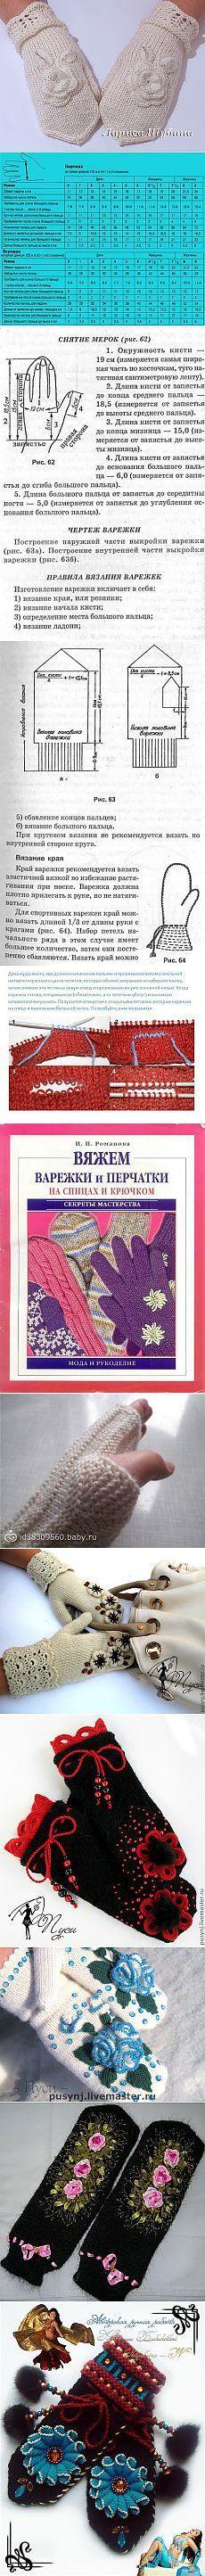 postila.ru Beautiful handmade gloves & mittens